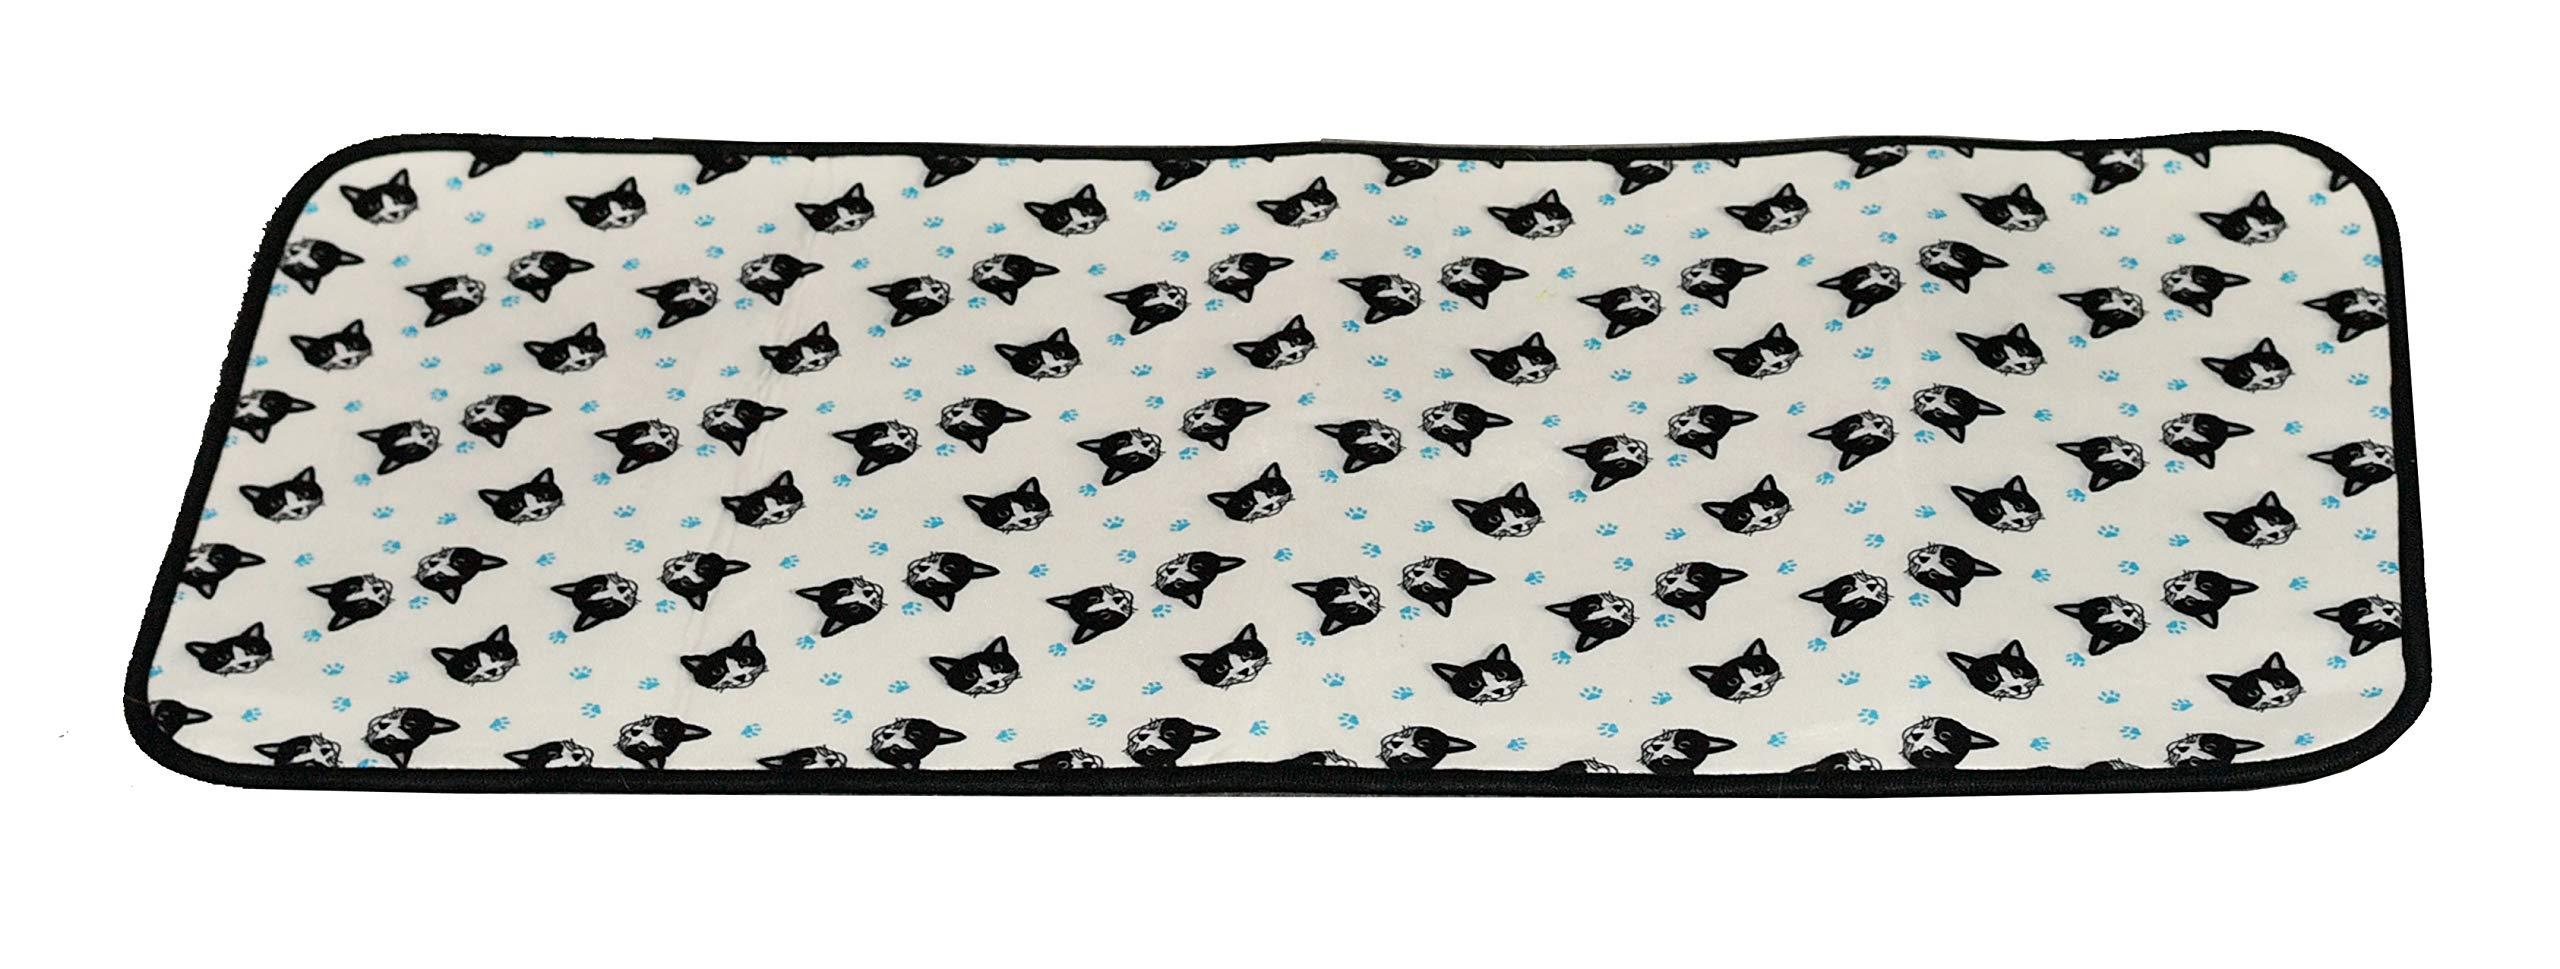 HOME-X Kitten Print Non-Slip Standing Mat for Kitchen or Bathroom, Cat Rug Home Décor